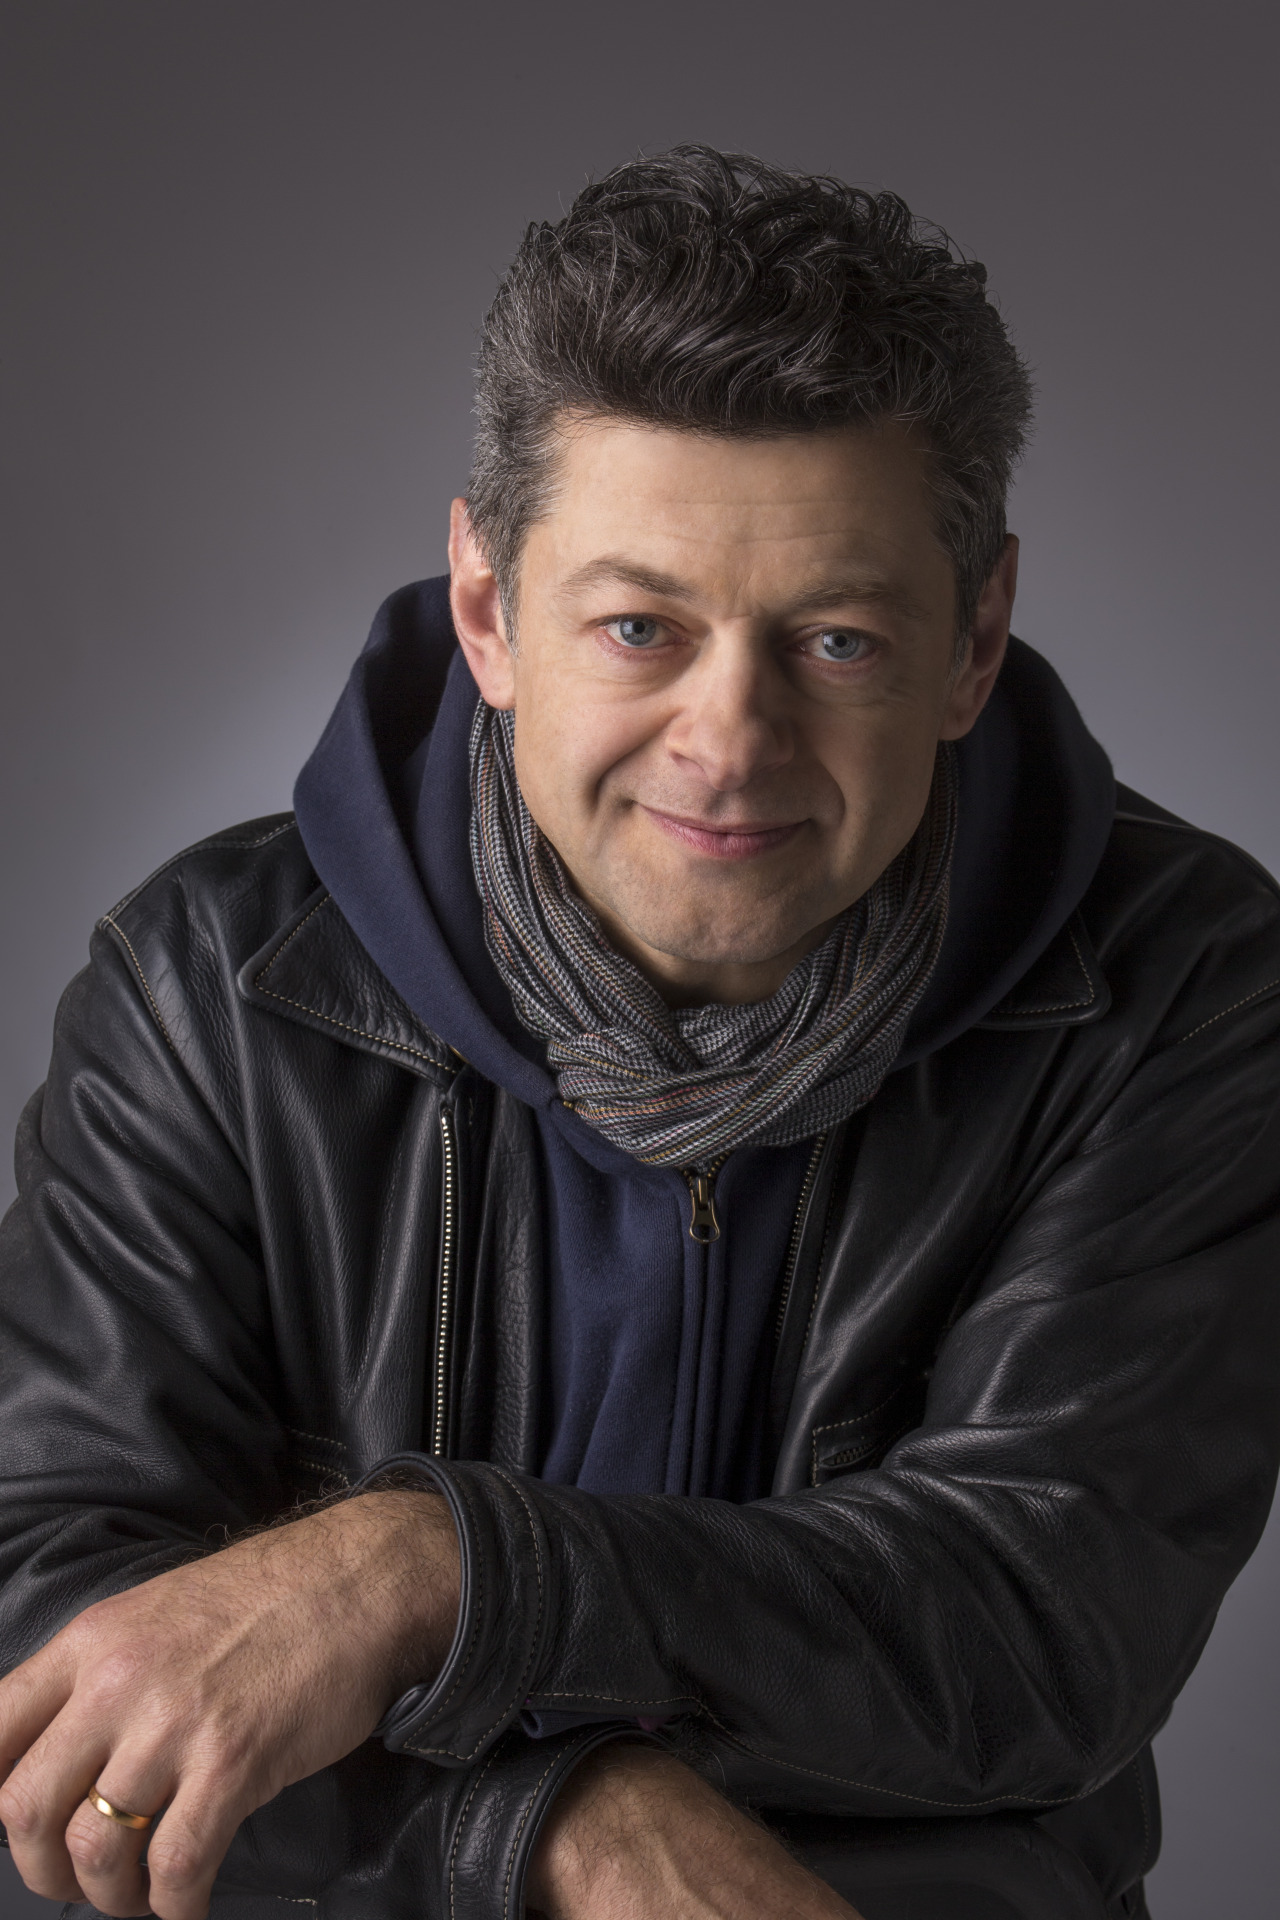 Andy Serkis (born 1964)